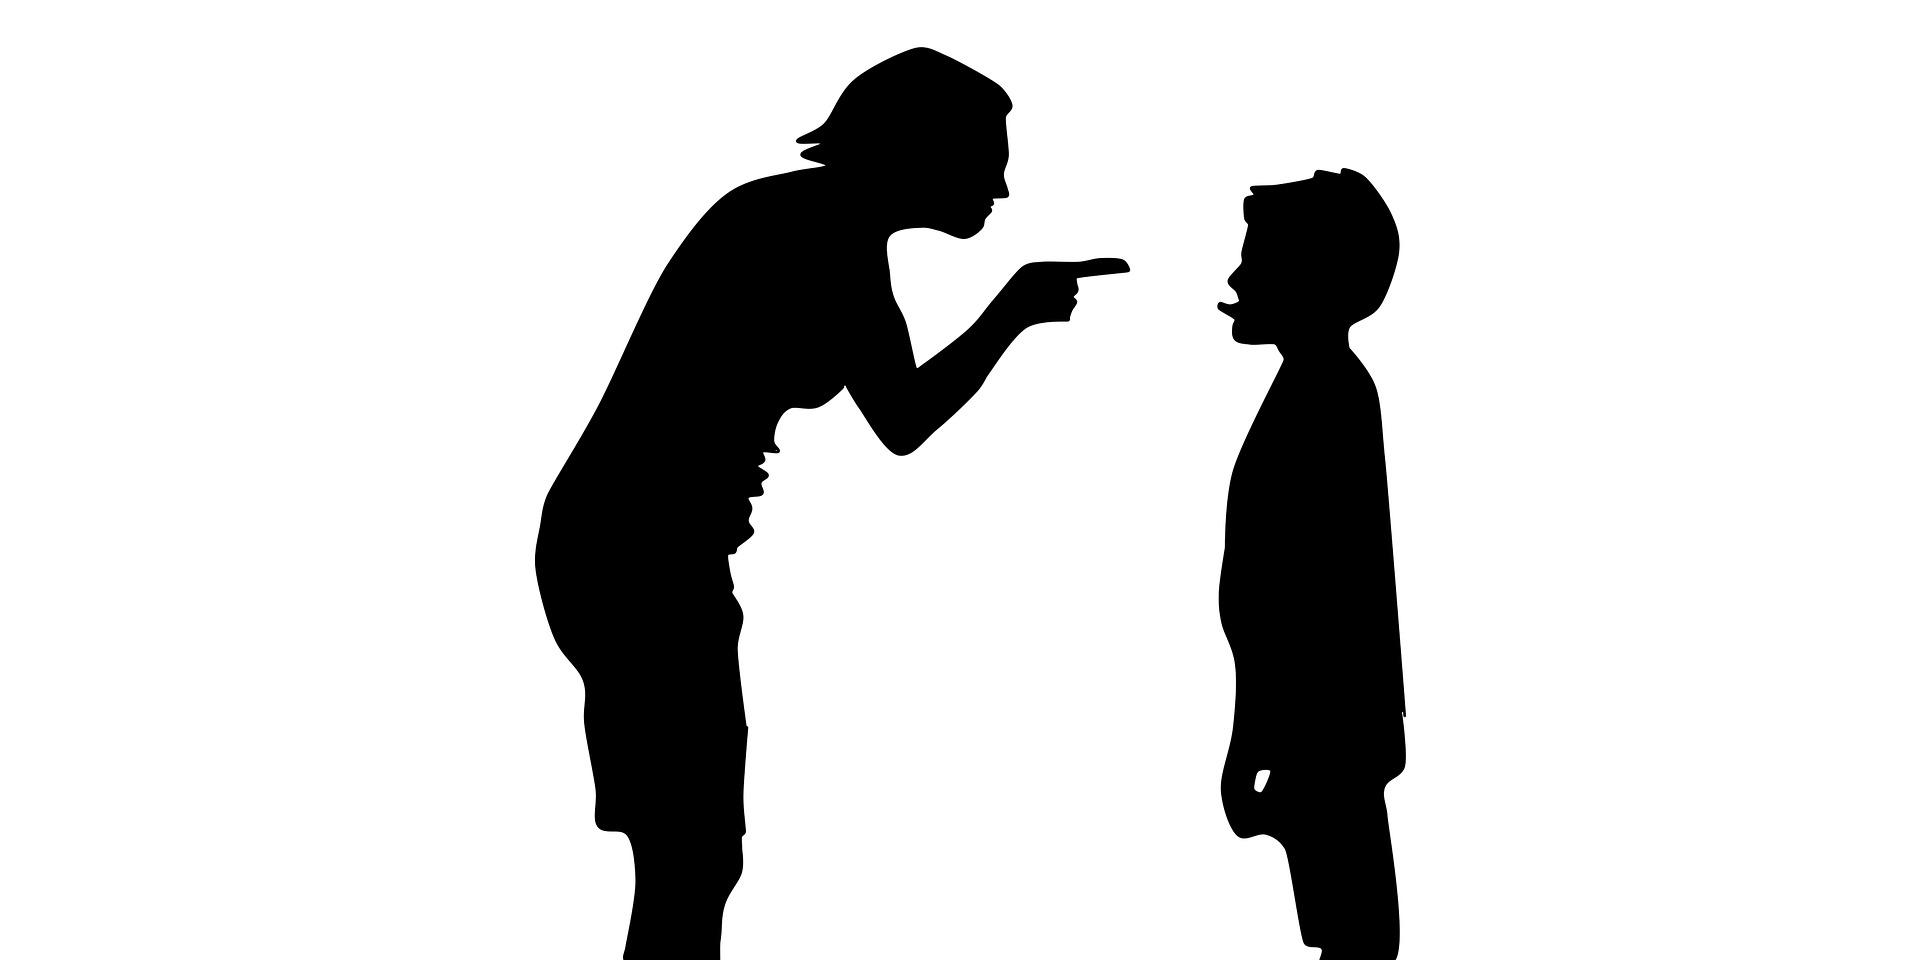 Disobedience merits punishment?